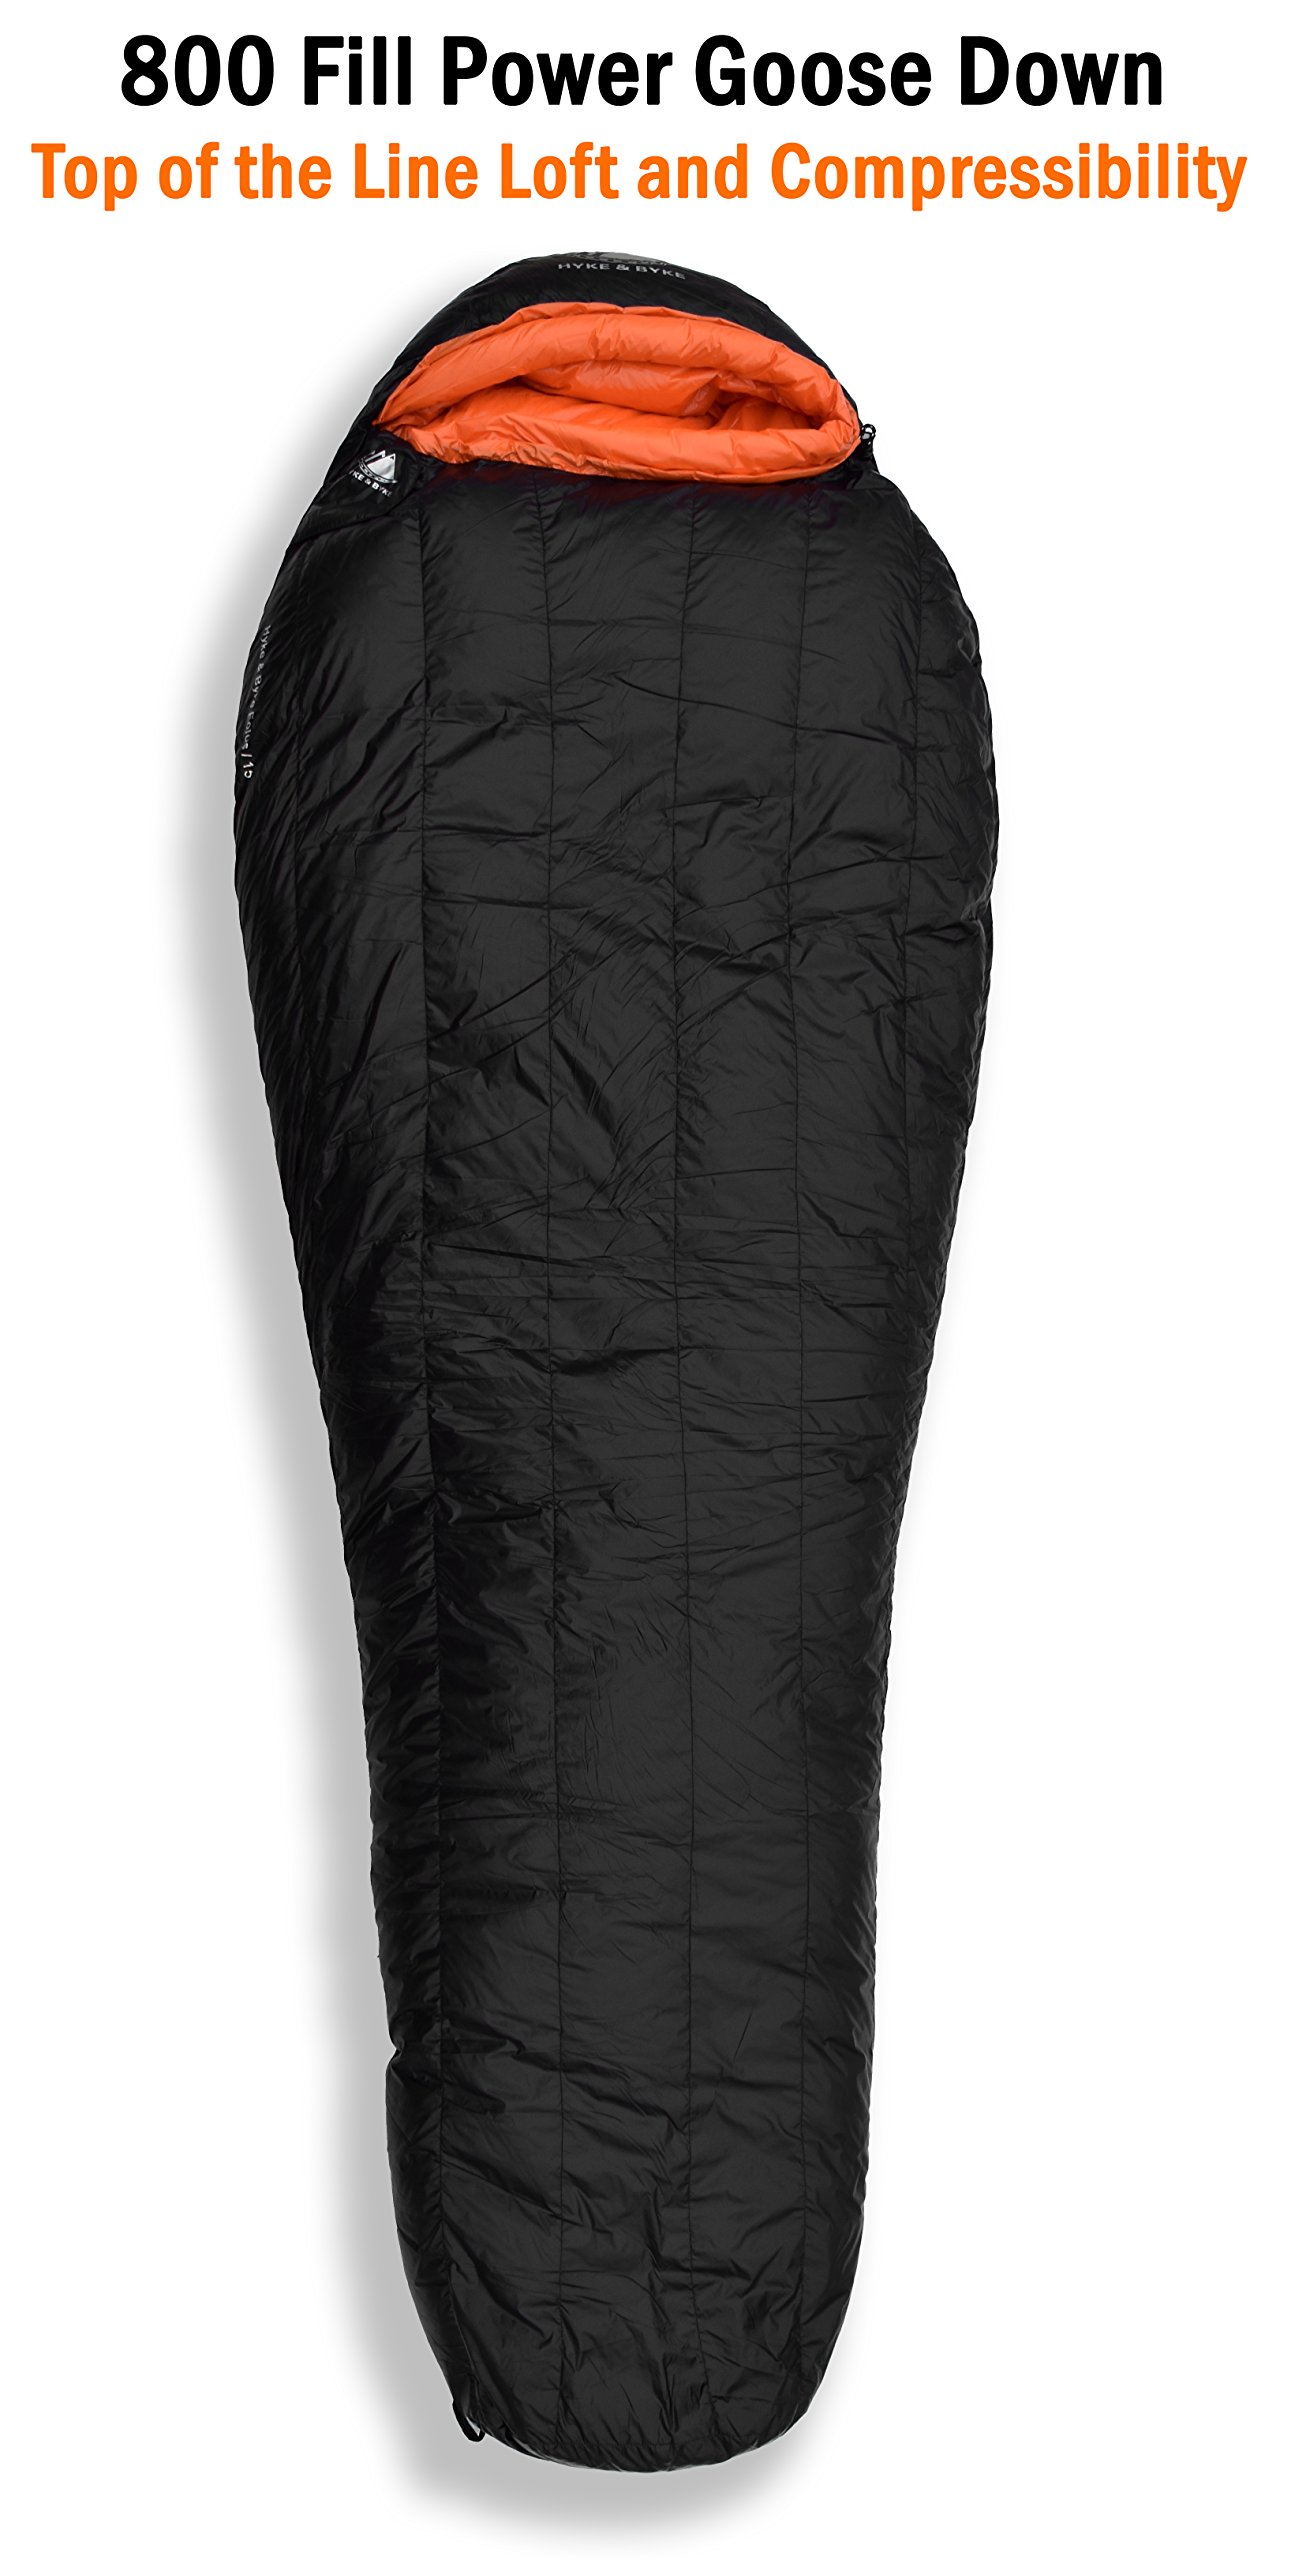 Hyke & Byke Eolus 15 & 30 Degree F 800 Fill Power Hydrophobic Goose Down Sleeping Bag with ClusterLoft Base - Ultra Lightweight 3 Season Men's and Women's Mummy Bag Designed for Backpacking 10